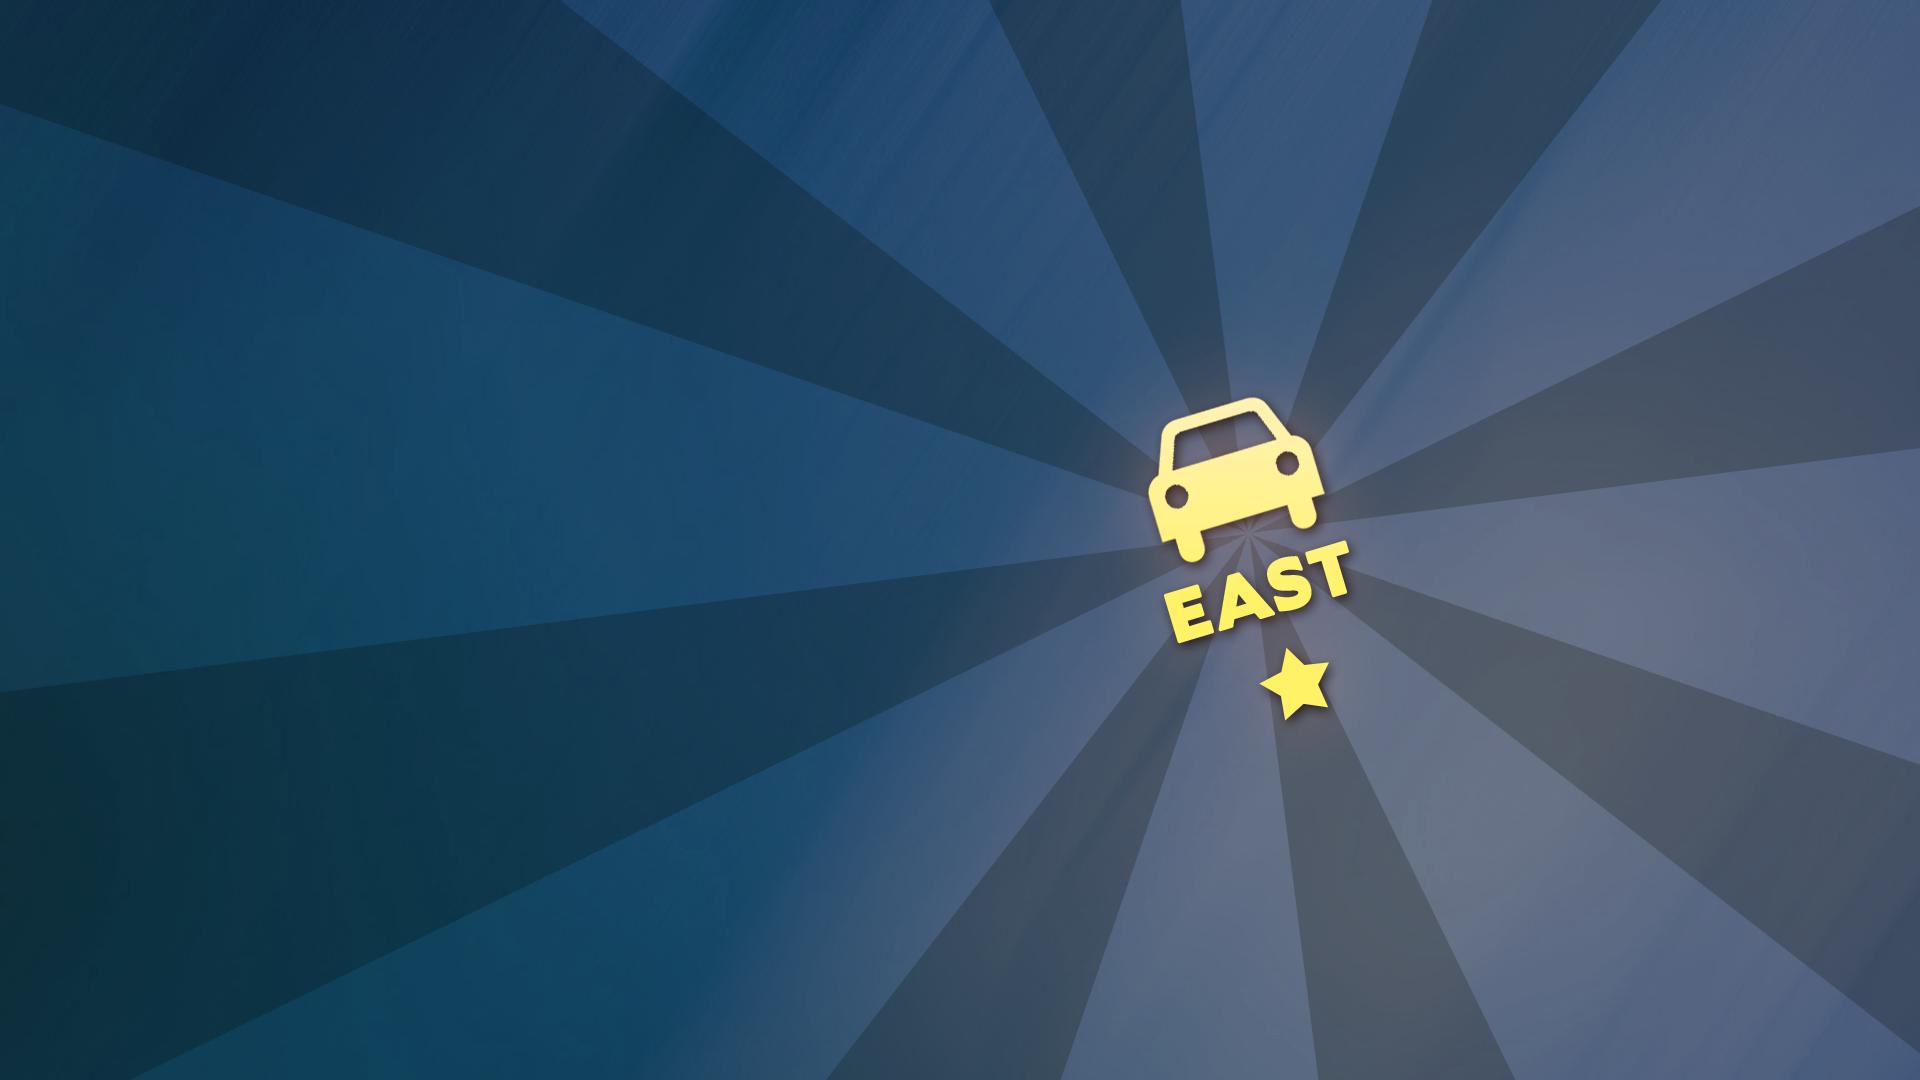 Car insignia 'East'